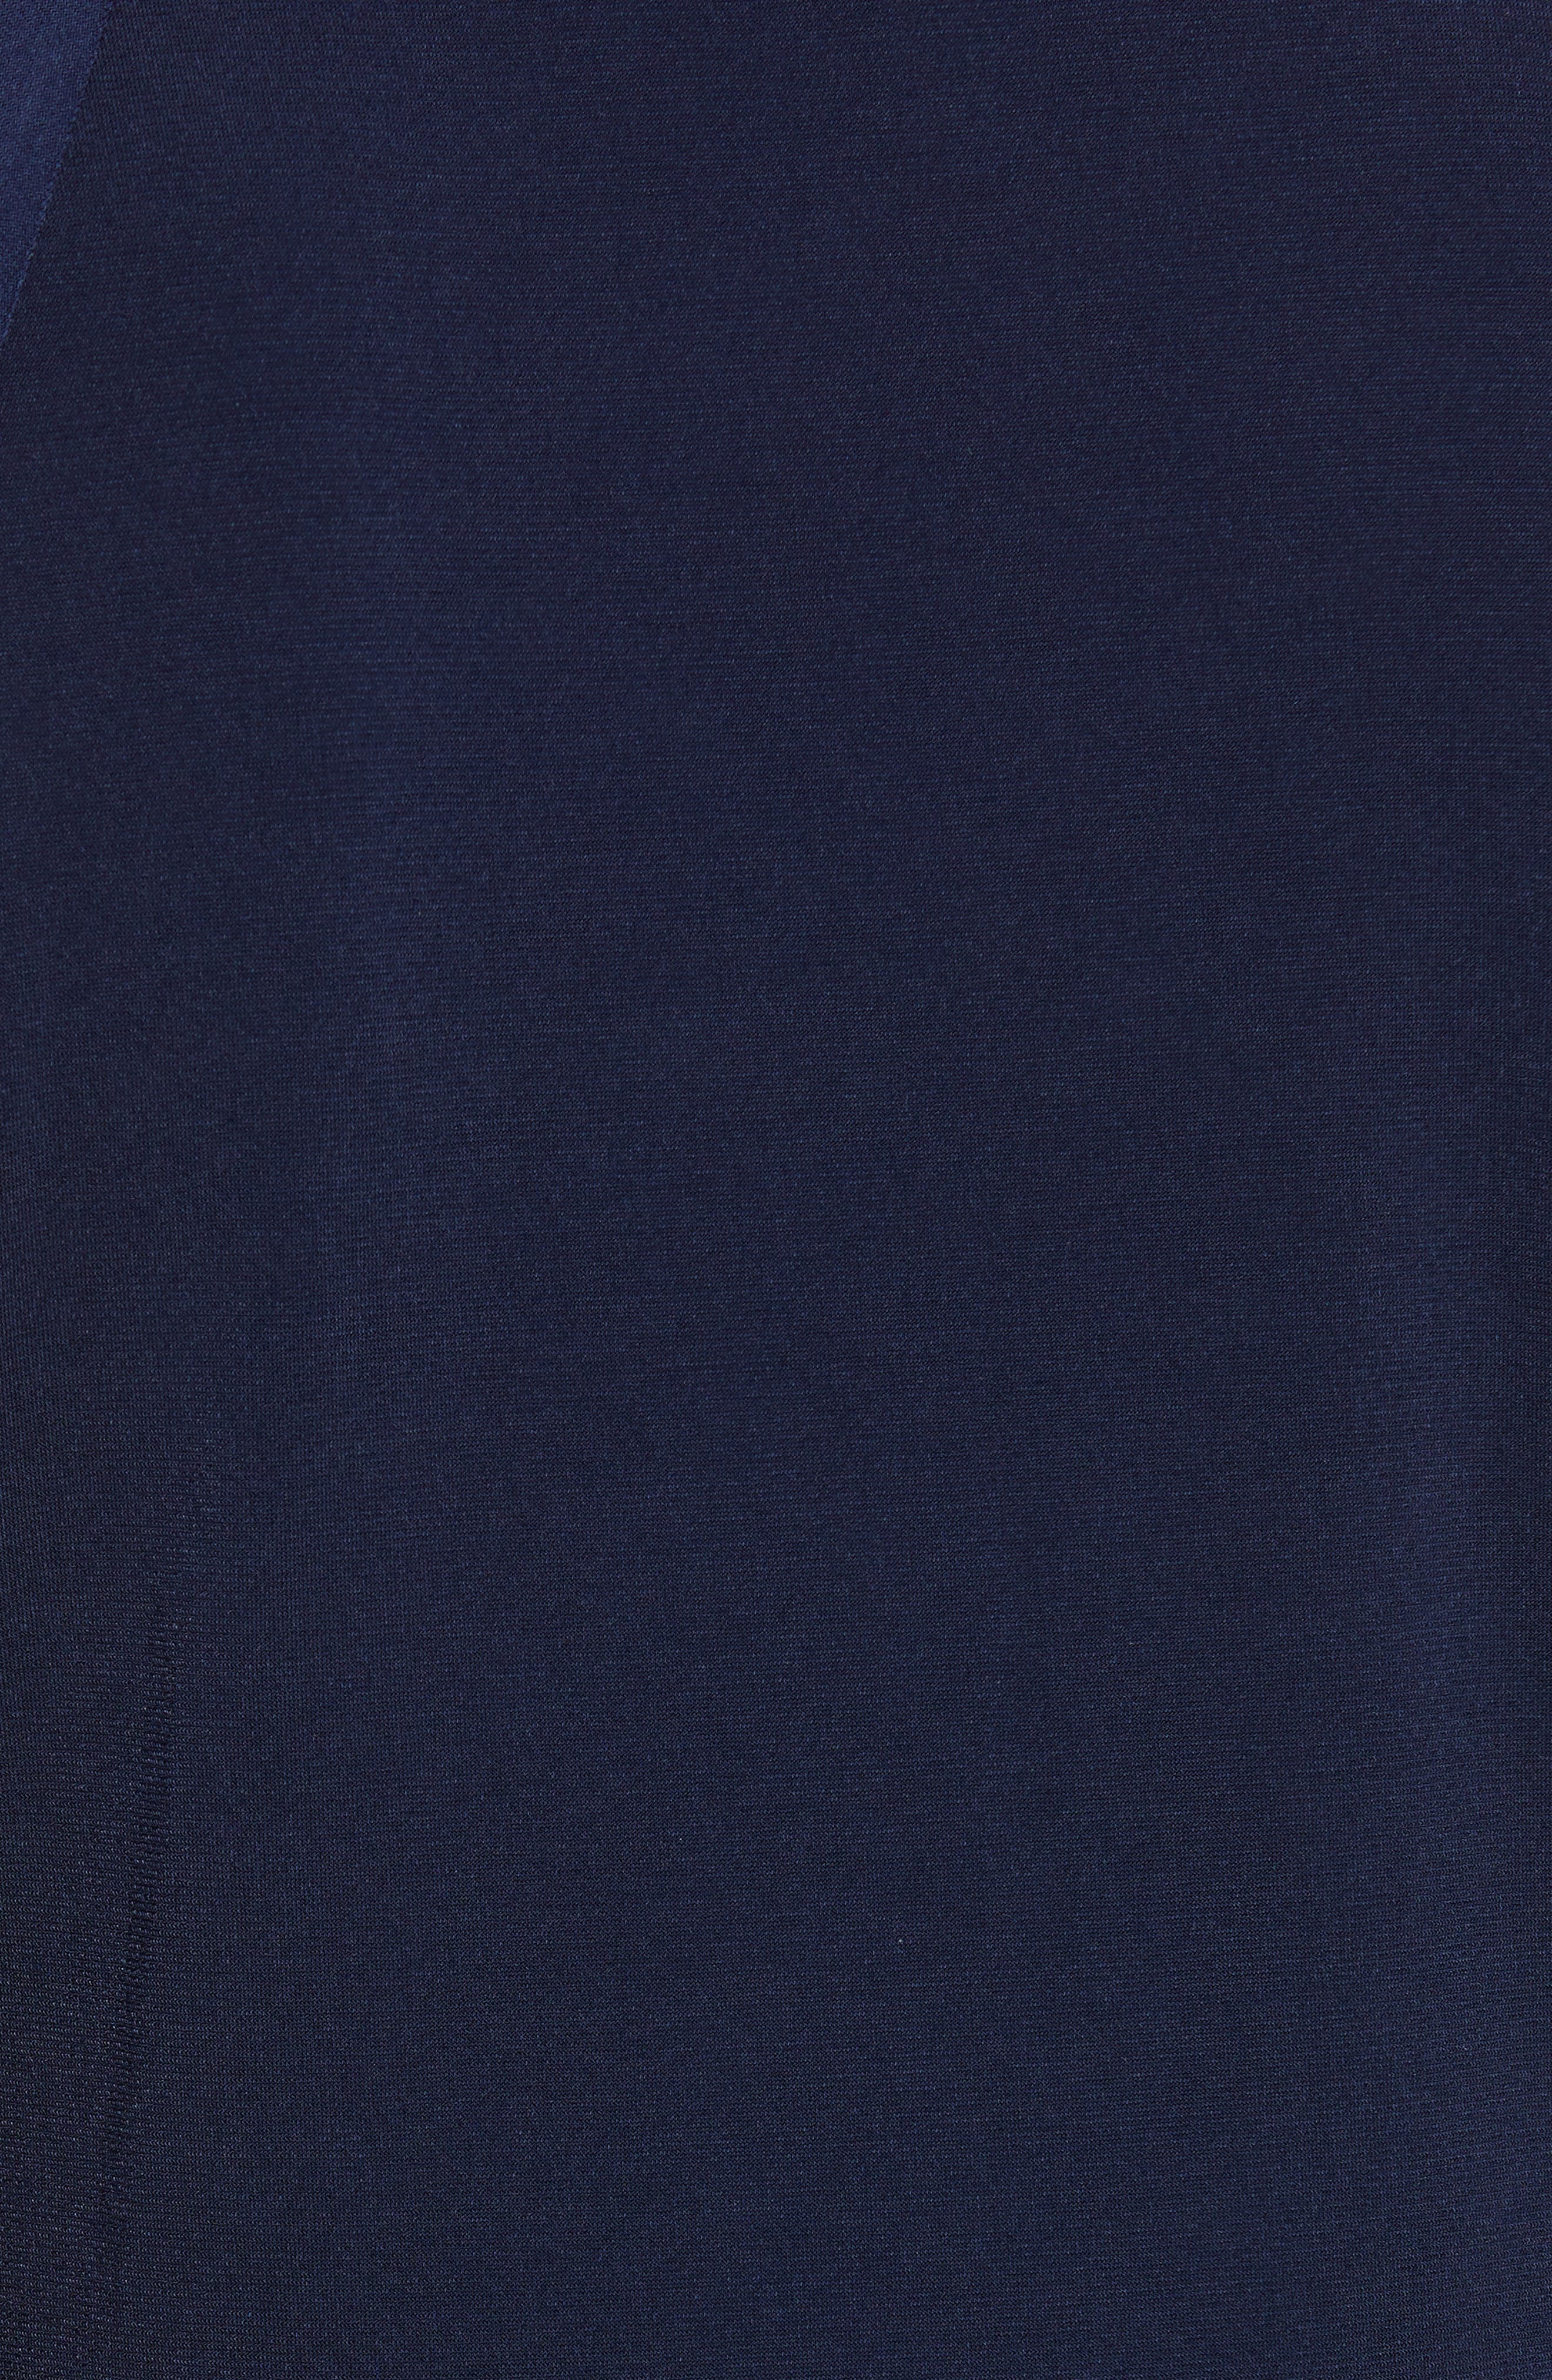 MICHAEL MICHAEL KORS,                             Chain Neck Top,                             Alternate thumbnail 5, color,                             TRUE NAVY